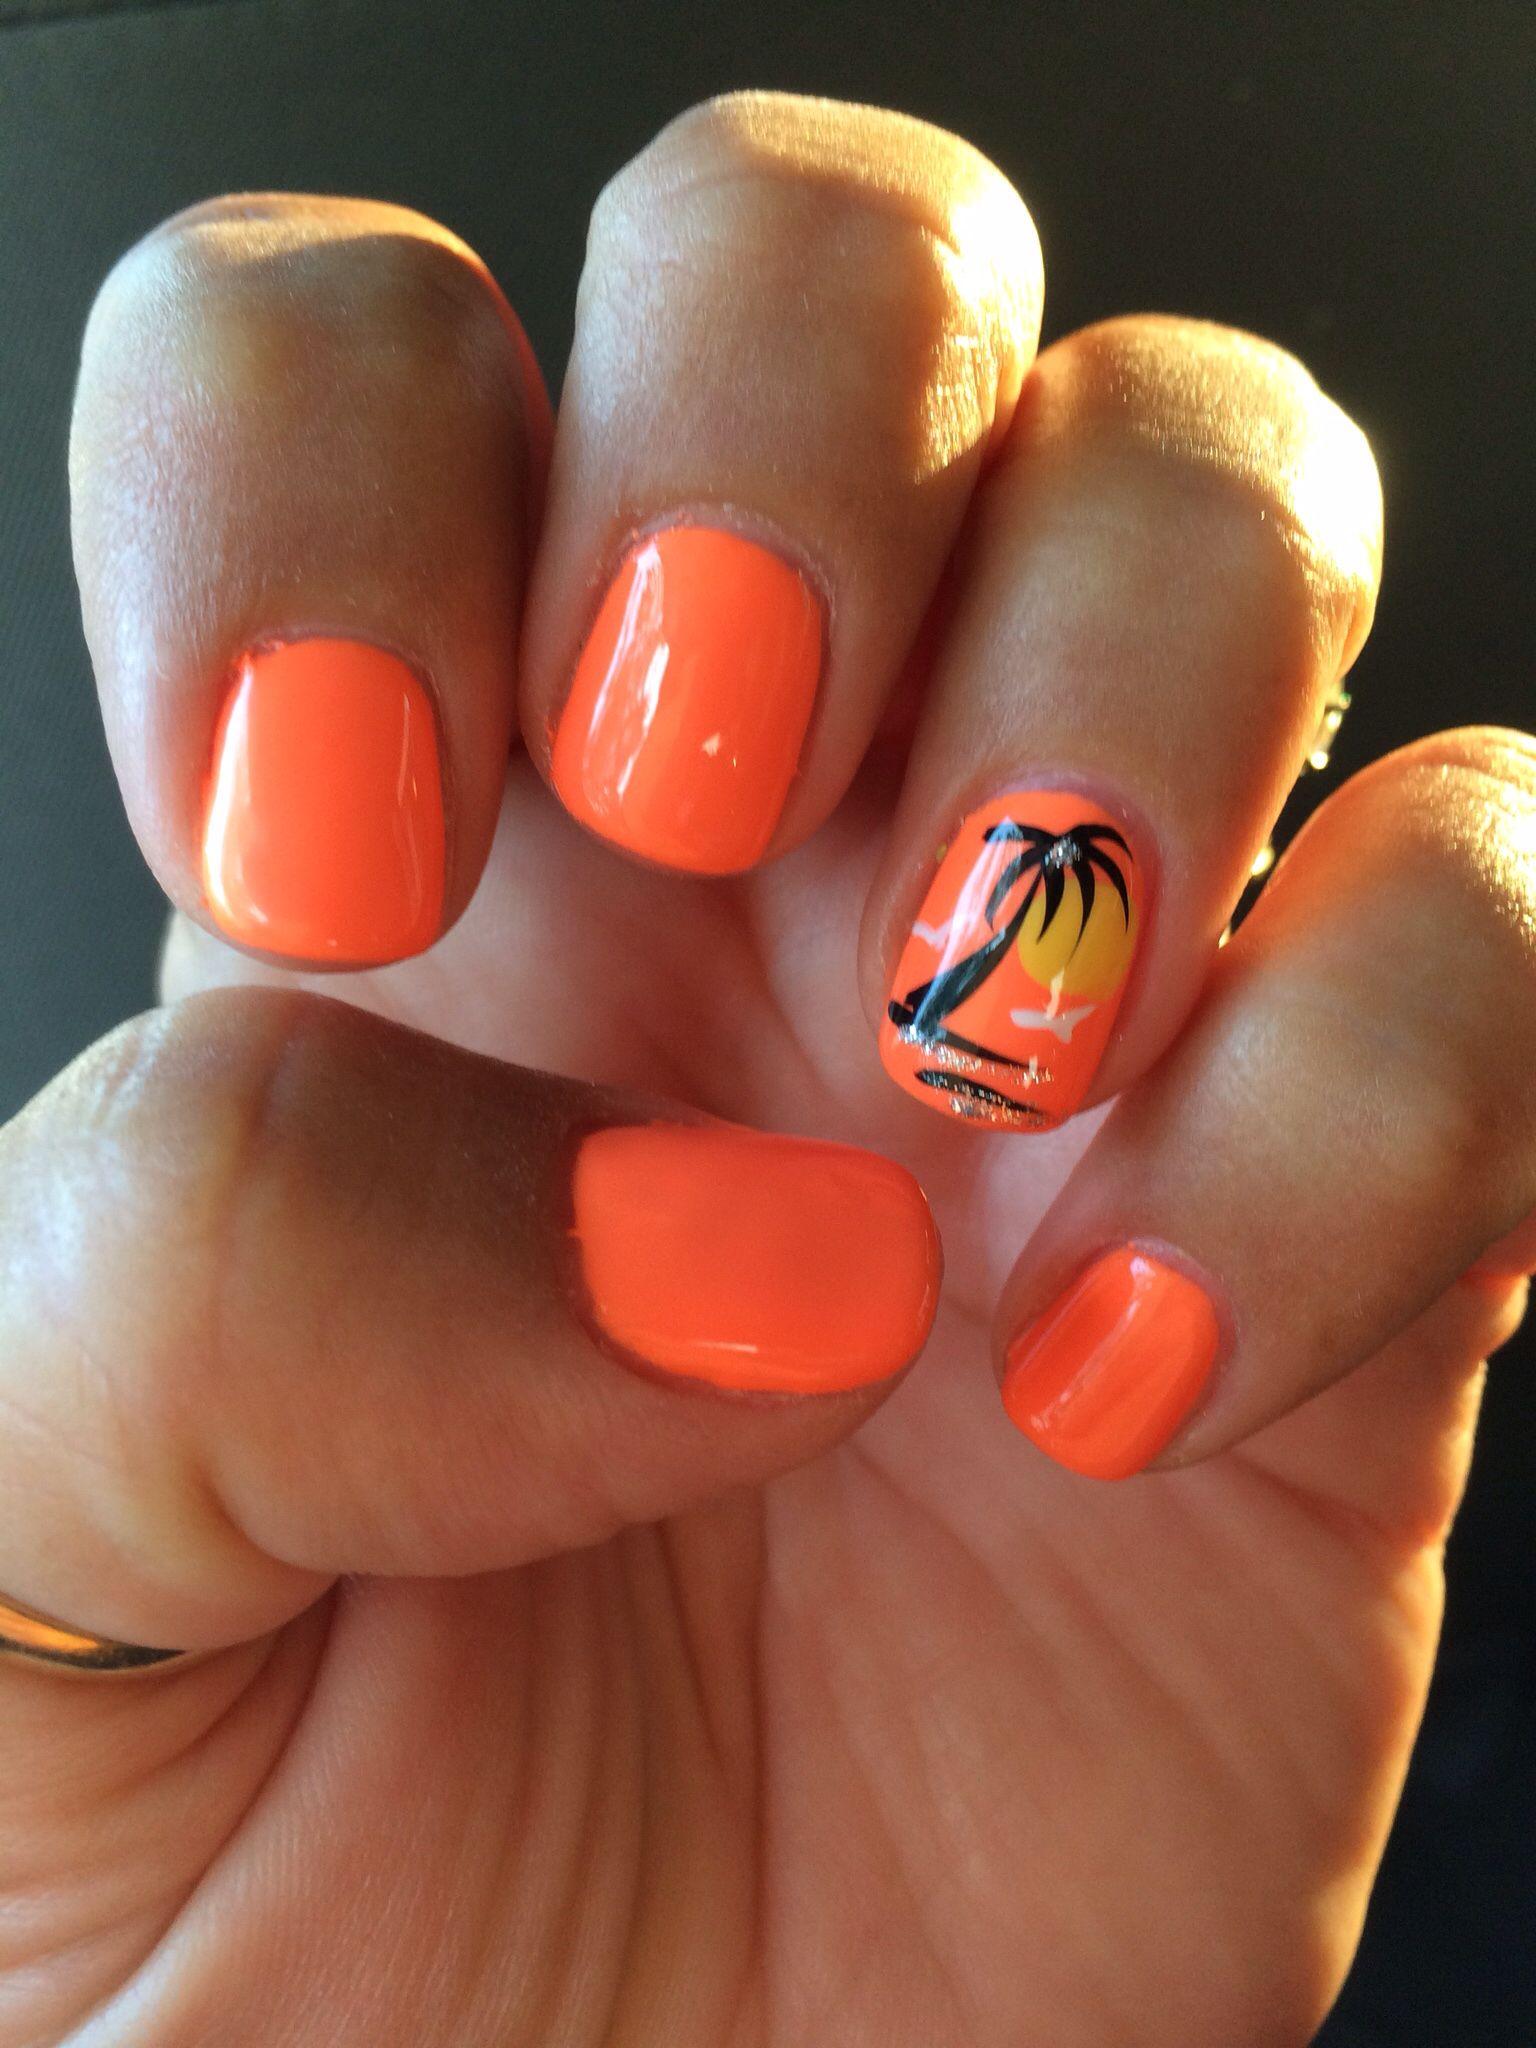 Orange Palm Tree Summer Gel Nails Summer Gel Nails Summer Toe Nails Nail Designs Summer Gel